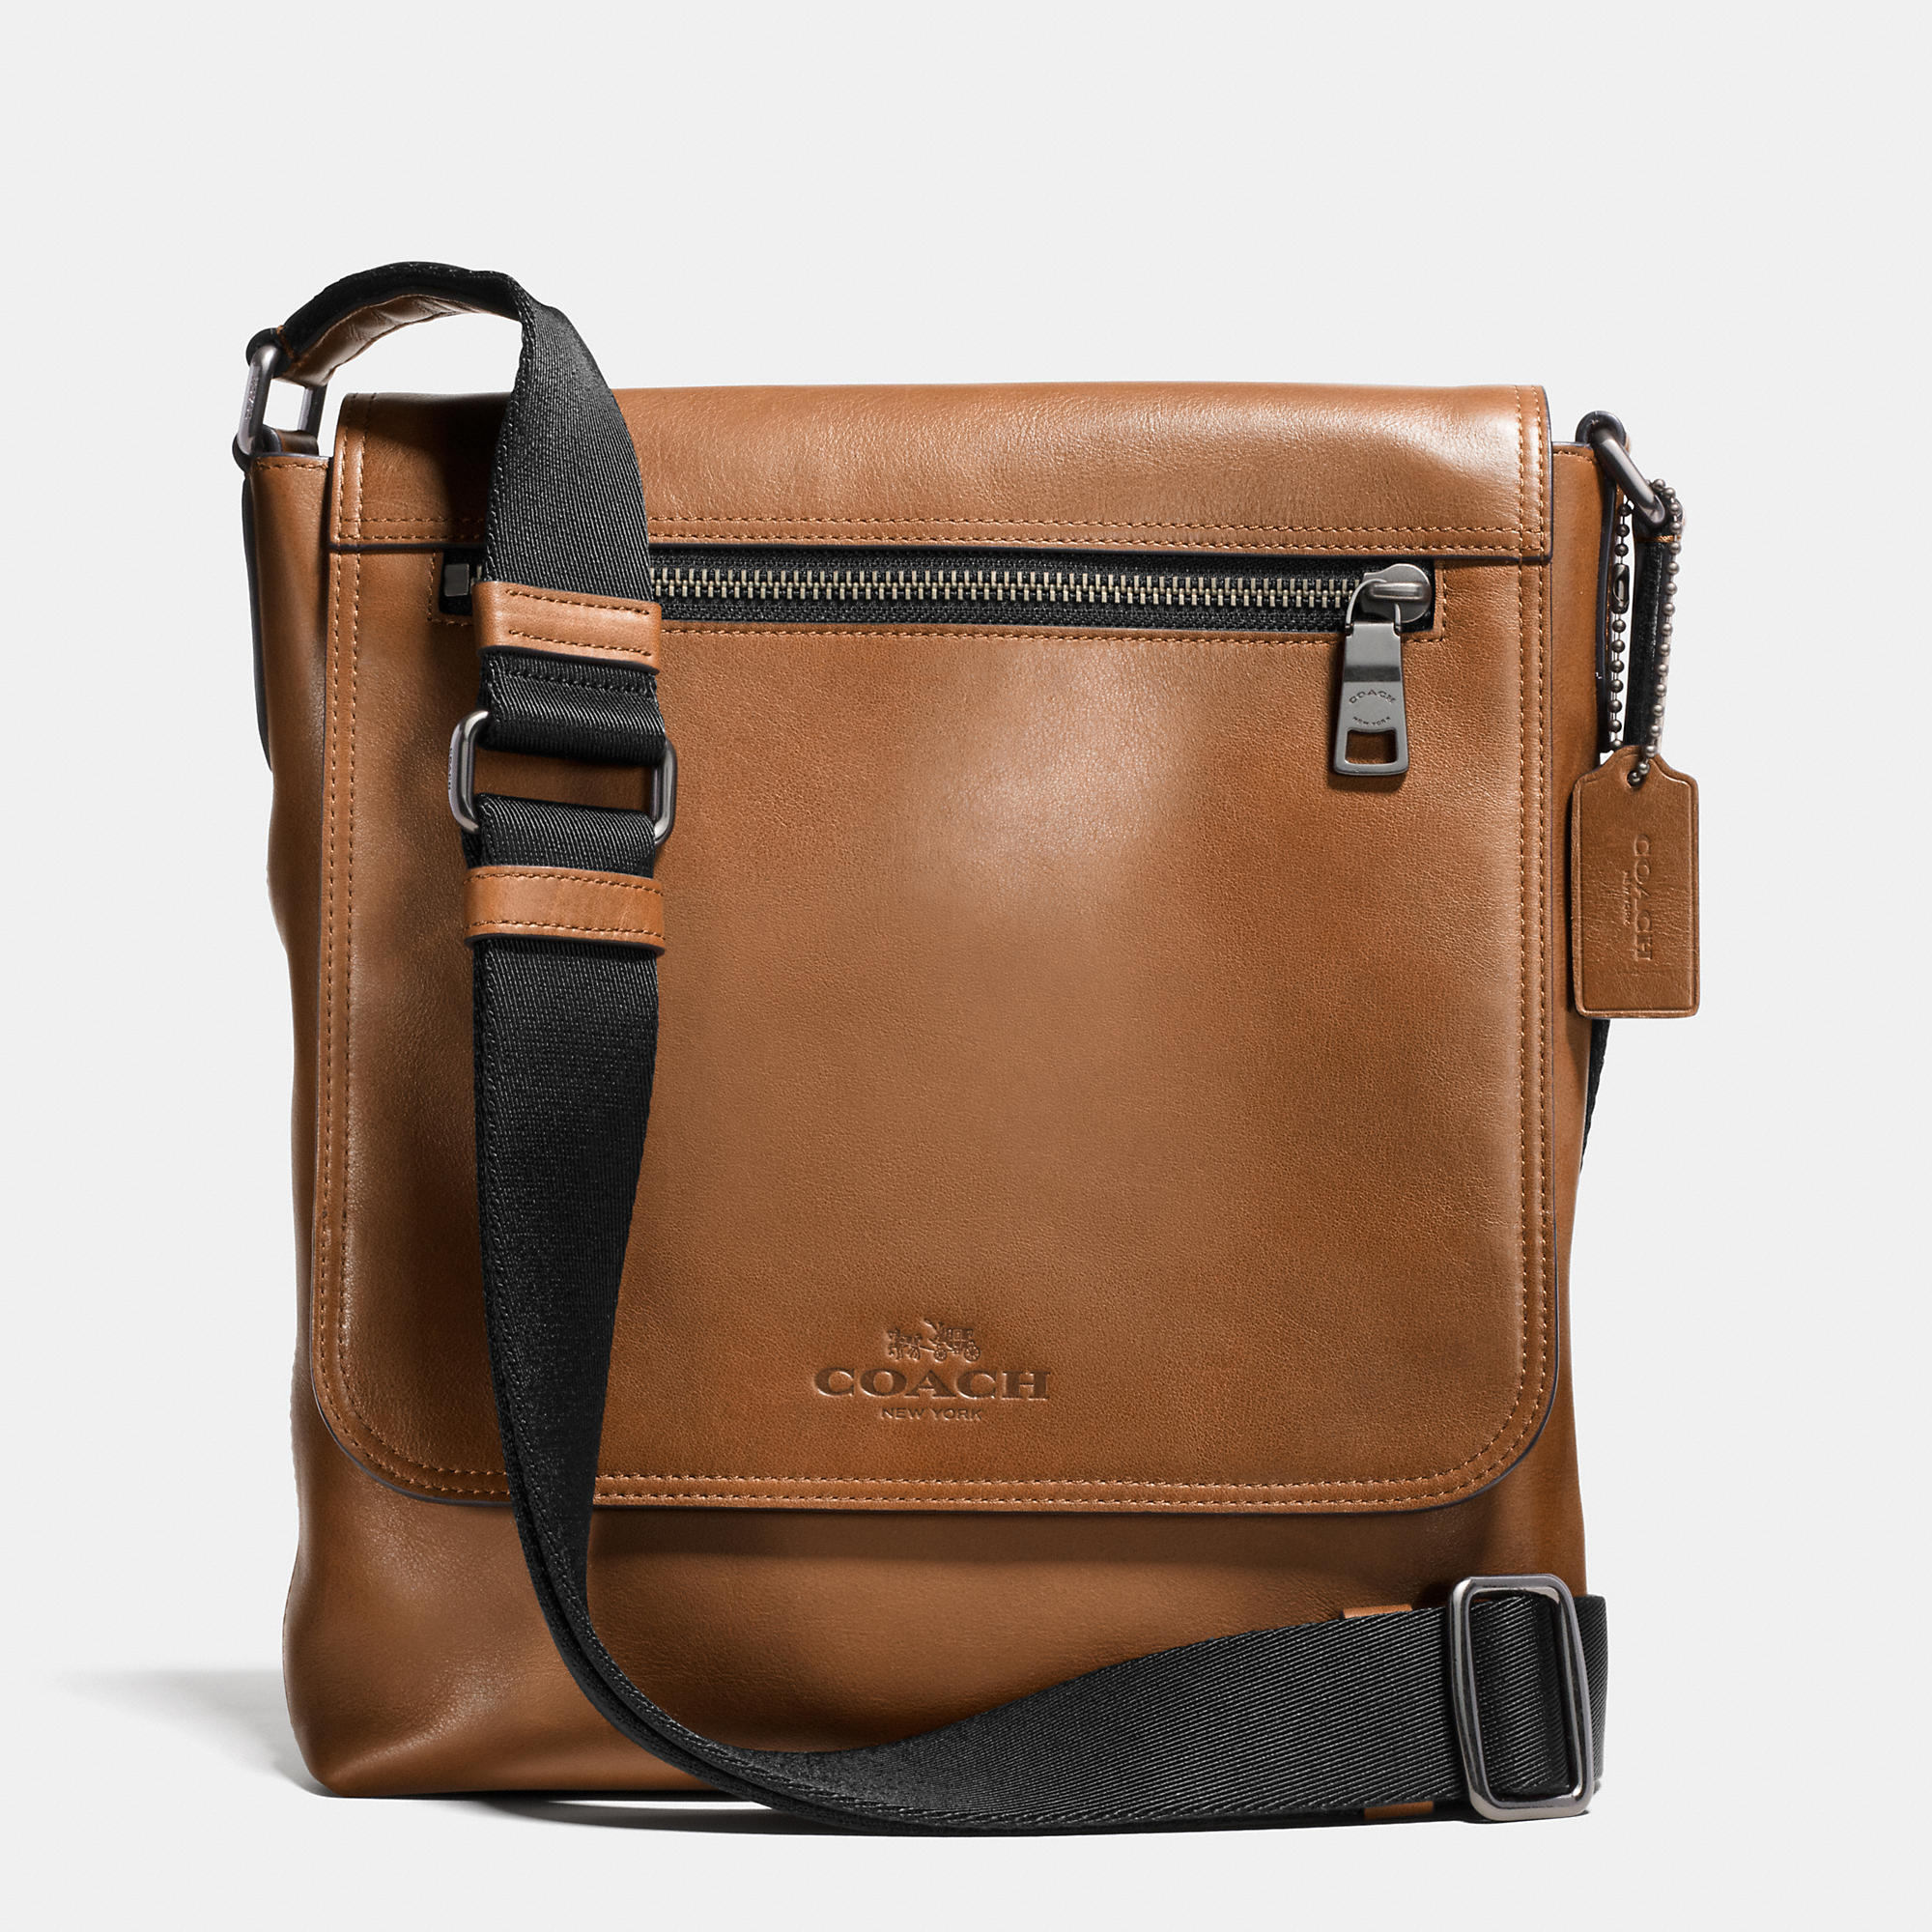 germany coach messenger bag small 43a68 f5077 00f4cb5c2f659